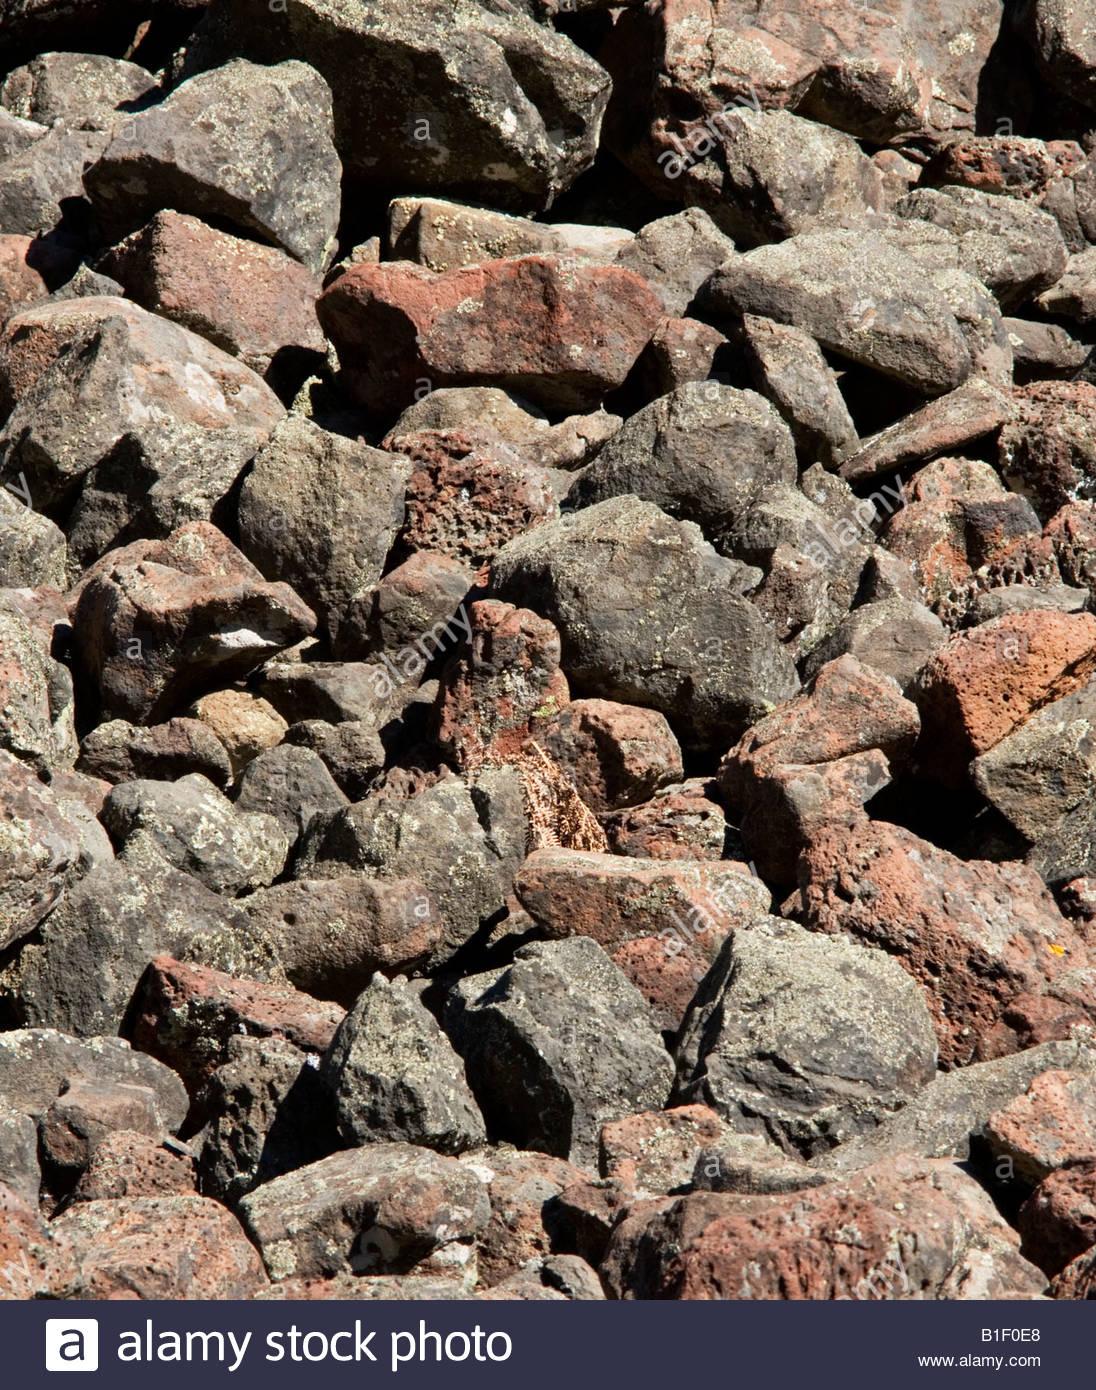 Textura natural de rocas de lava negros rojos Imagen De Stock